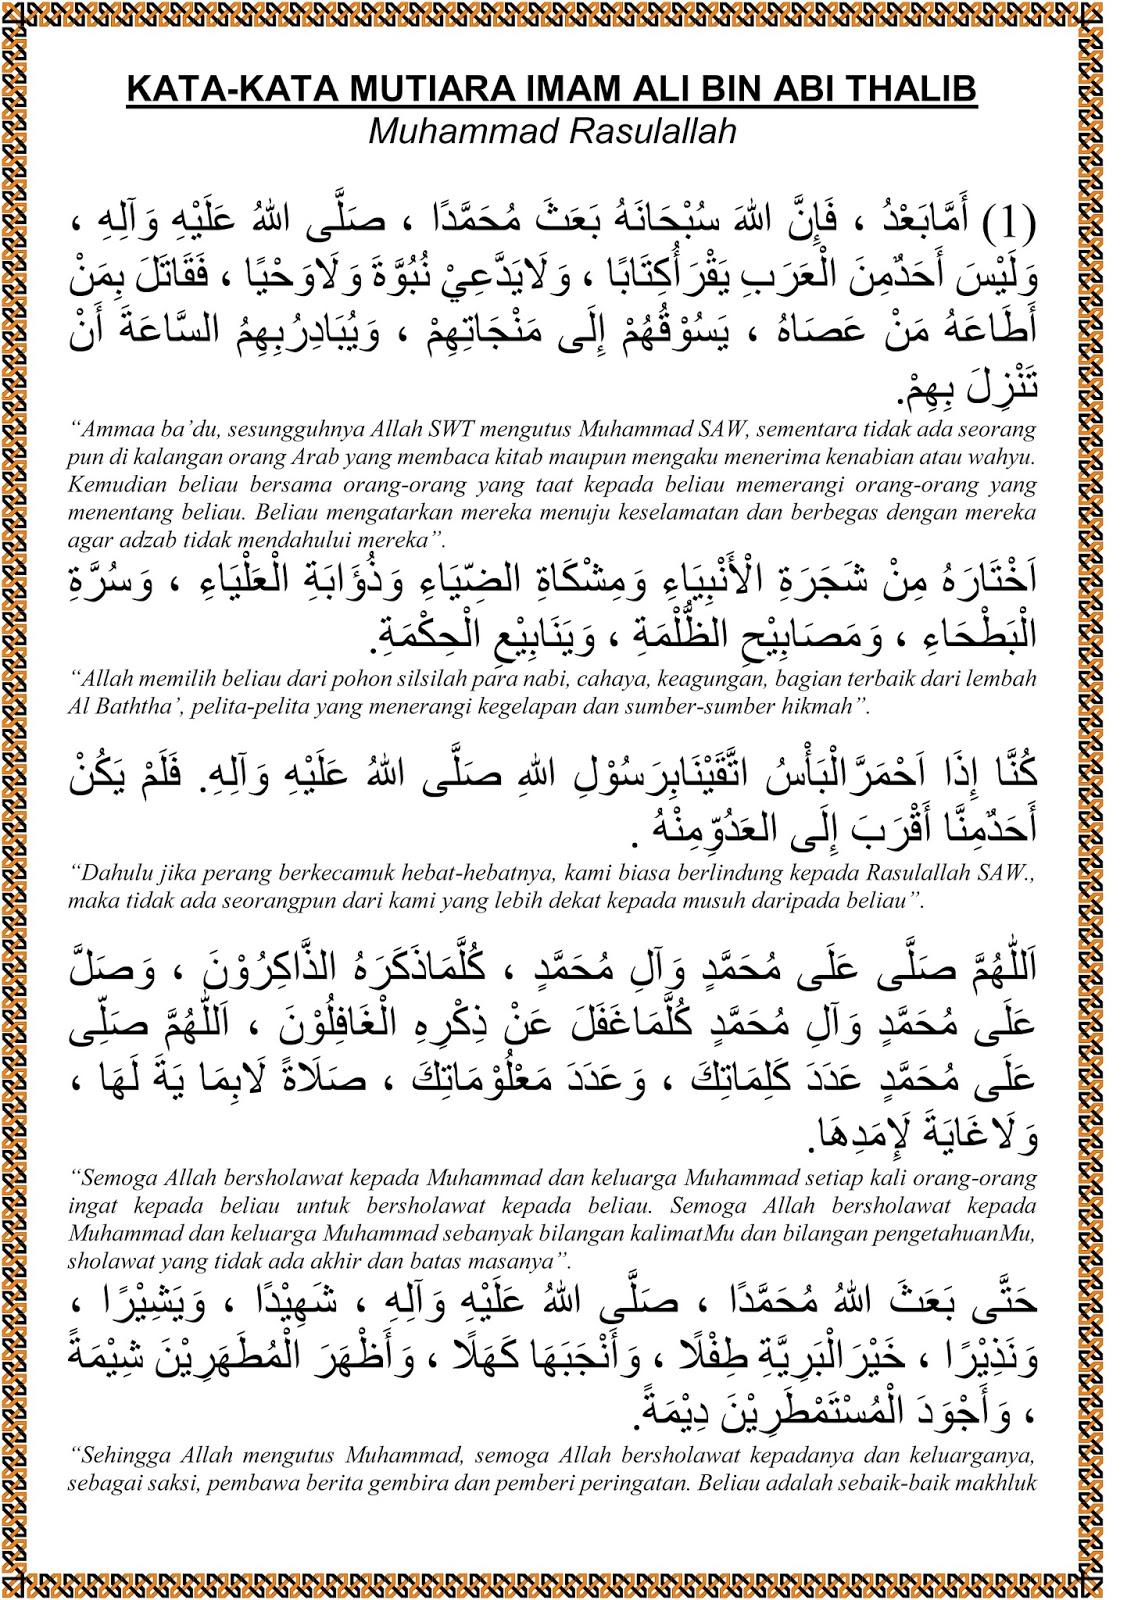 Muhammad Rasulallah Kata Kata Mutiara Imam Ali Bin Abi Thalib Majelis Ta Lim Almunawwarah